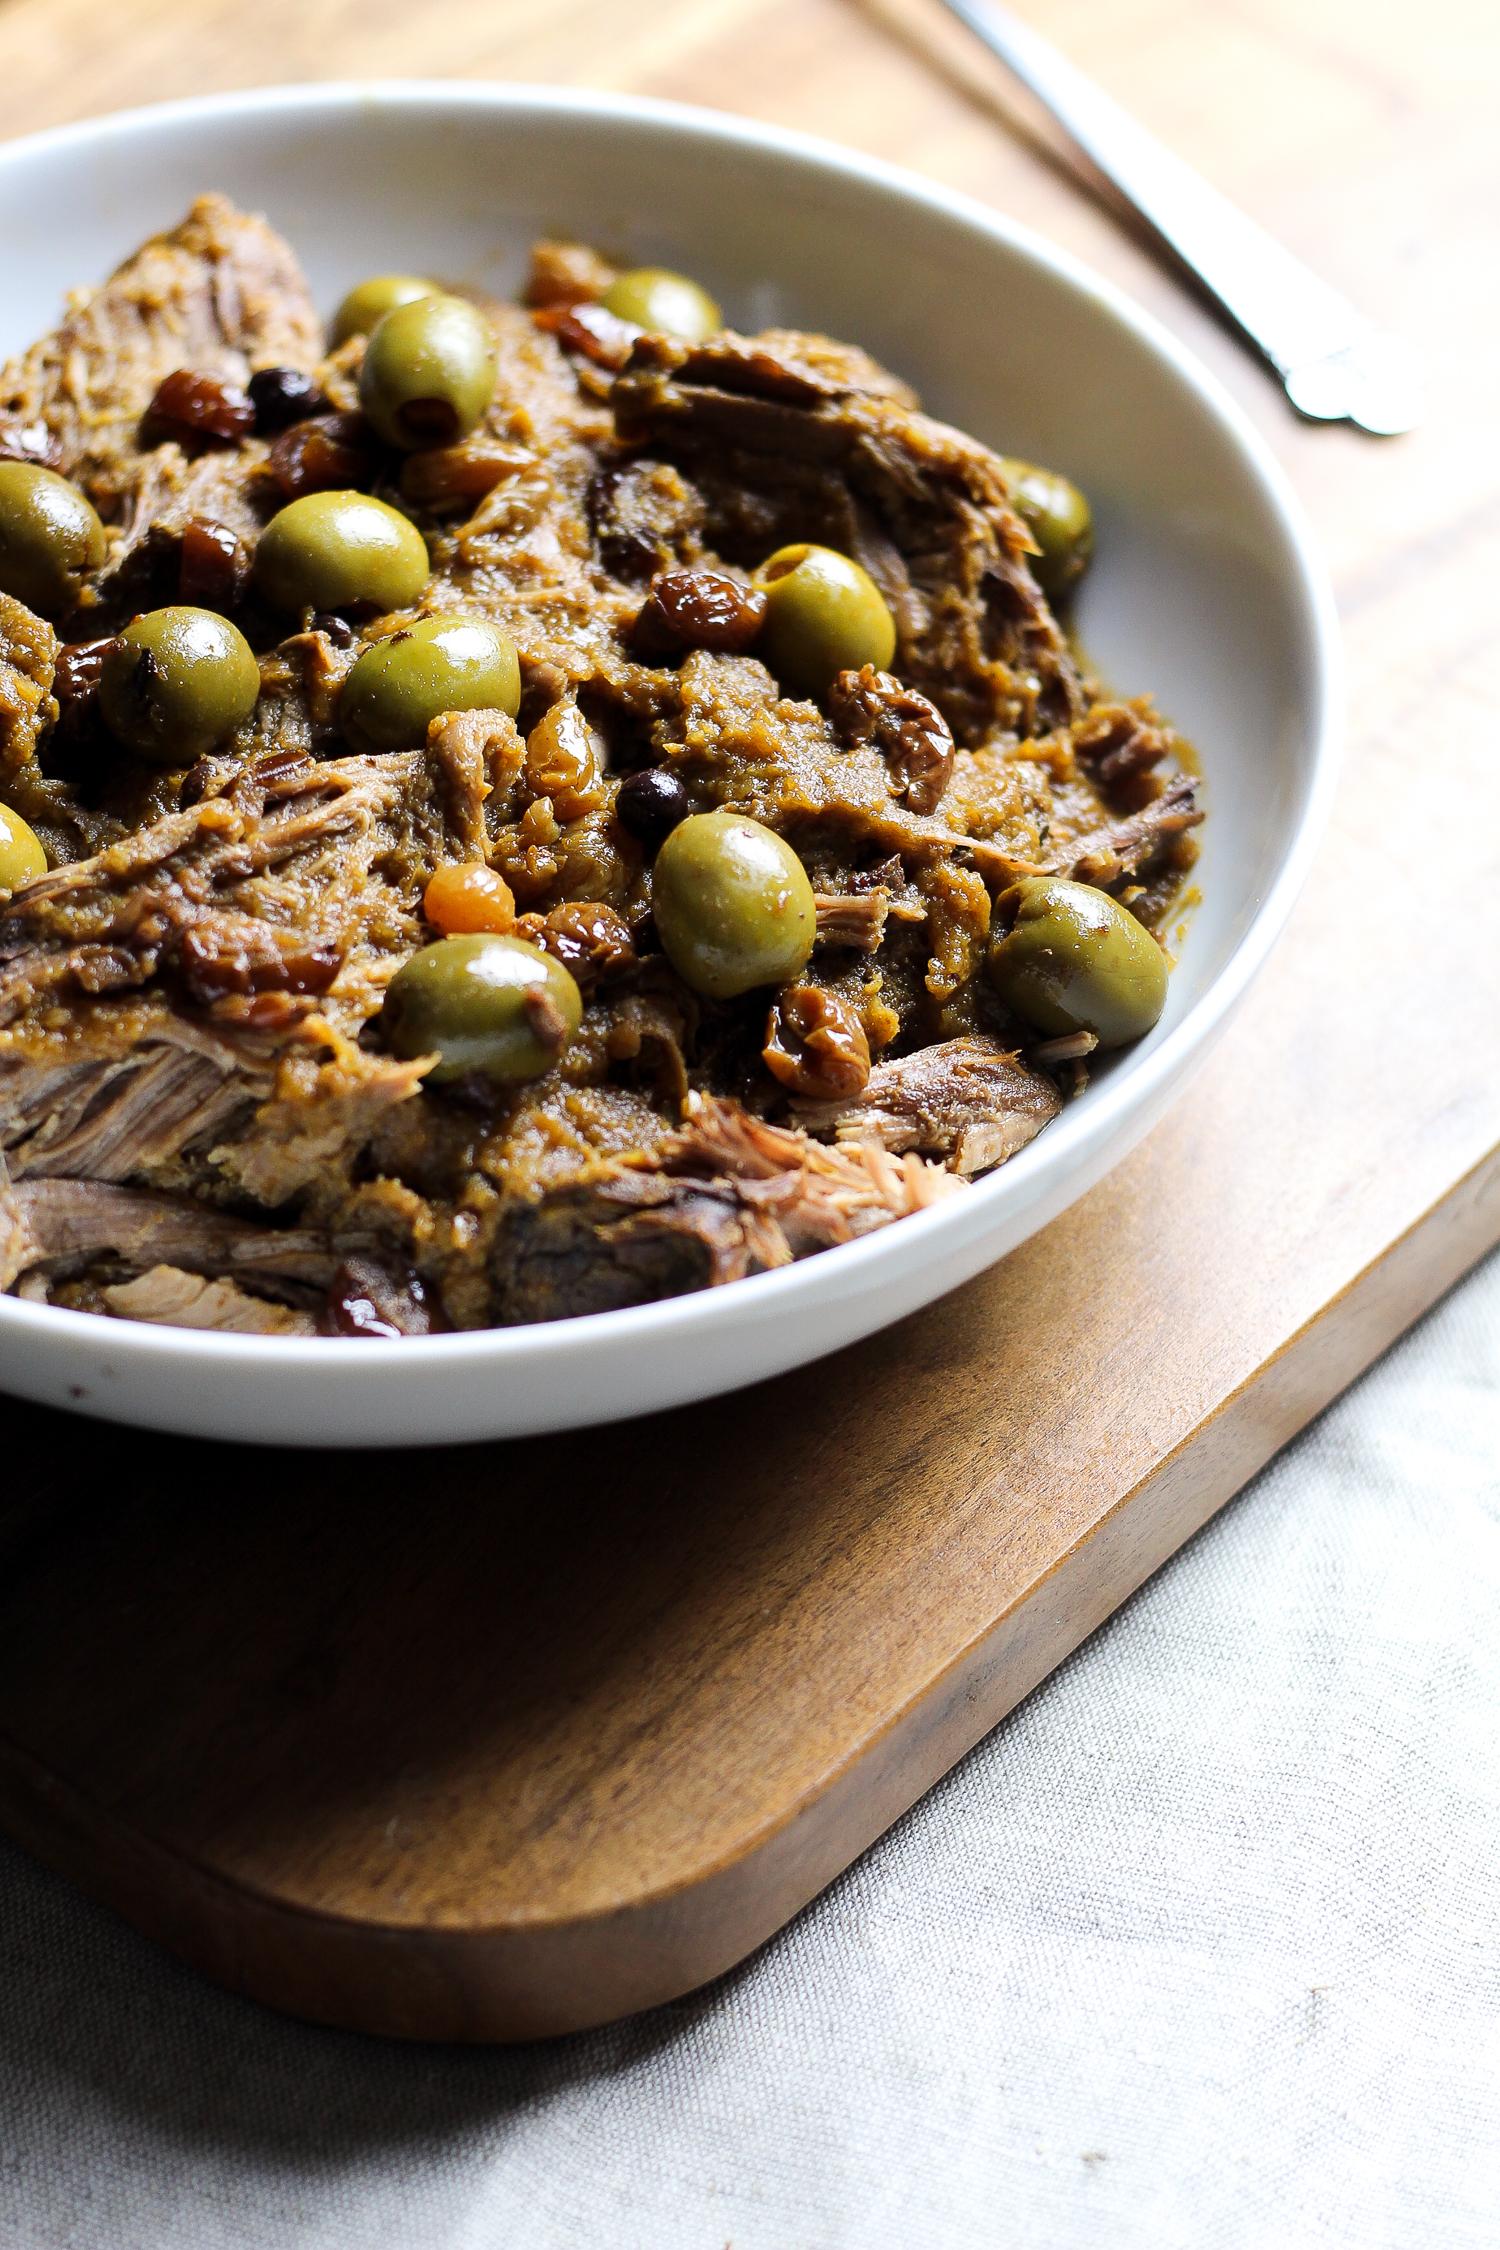 Alton Brown's Slow-Cooker Paleo Pot Roast via Worthy Pause